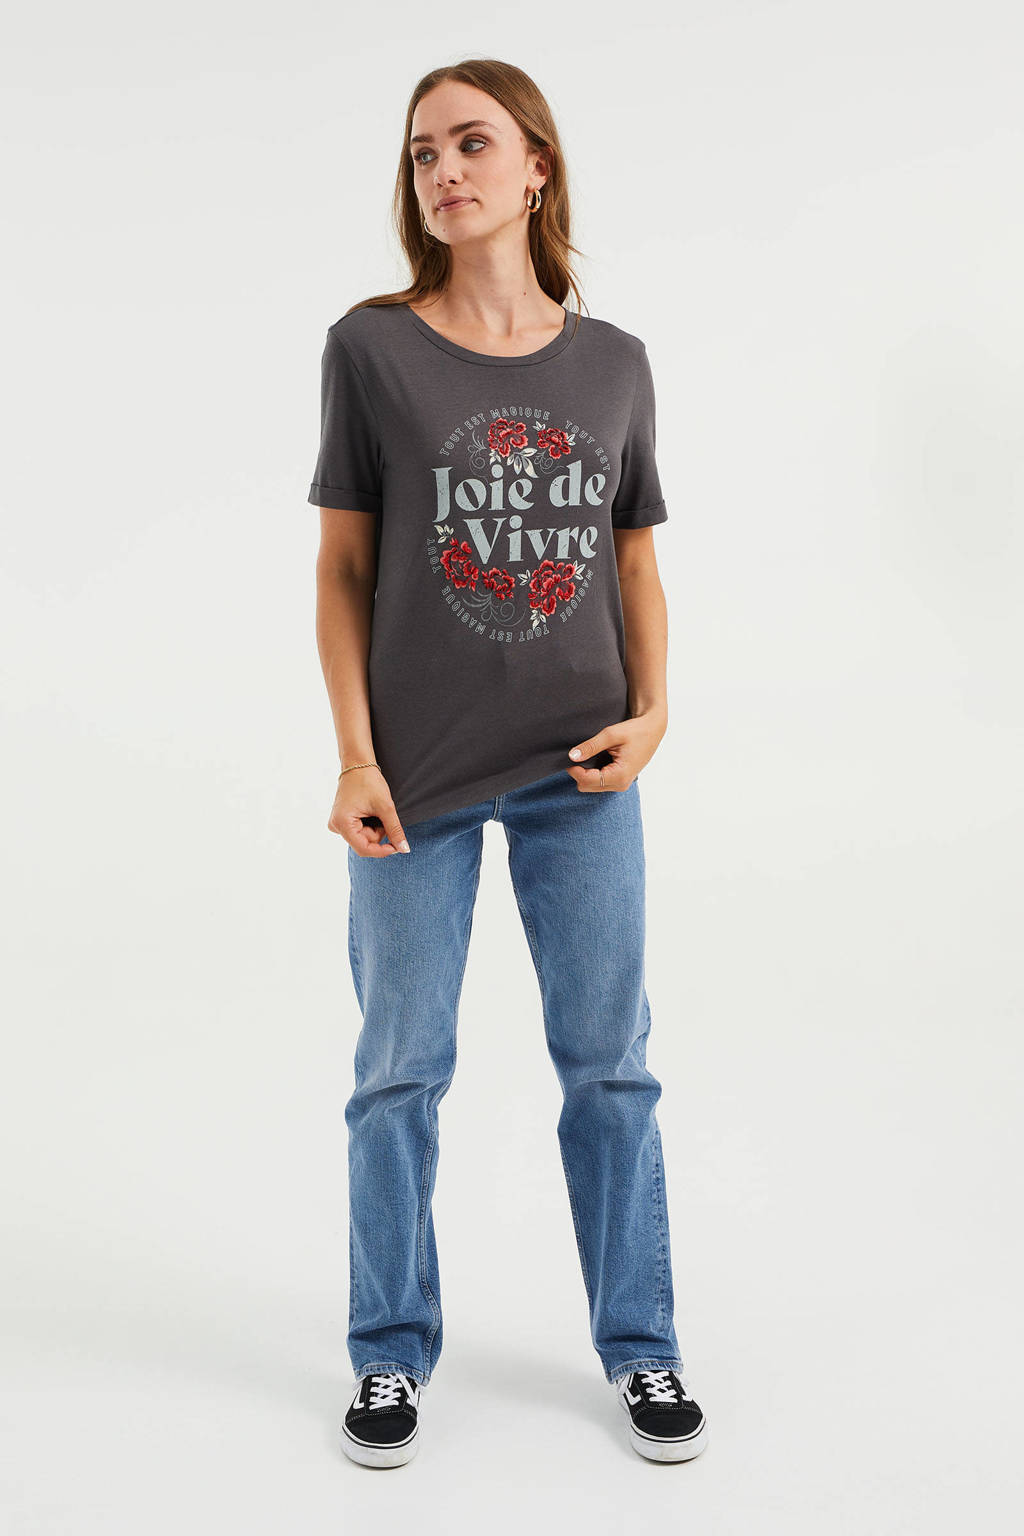 WE Fashion T-shirt met printopdruk donkergroen, Donkergroen